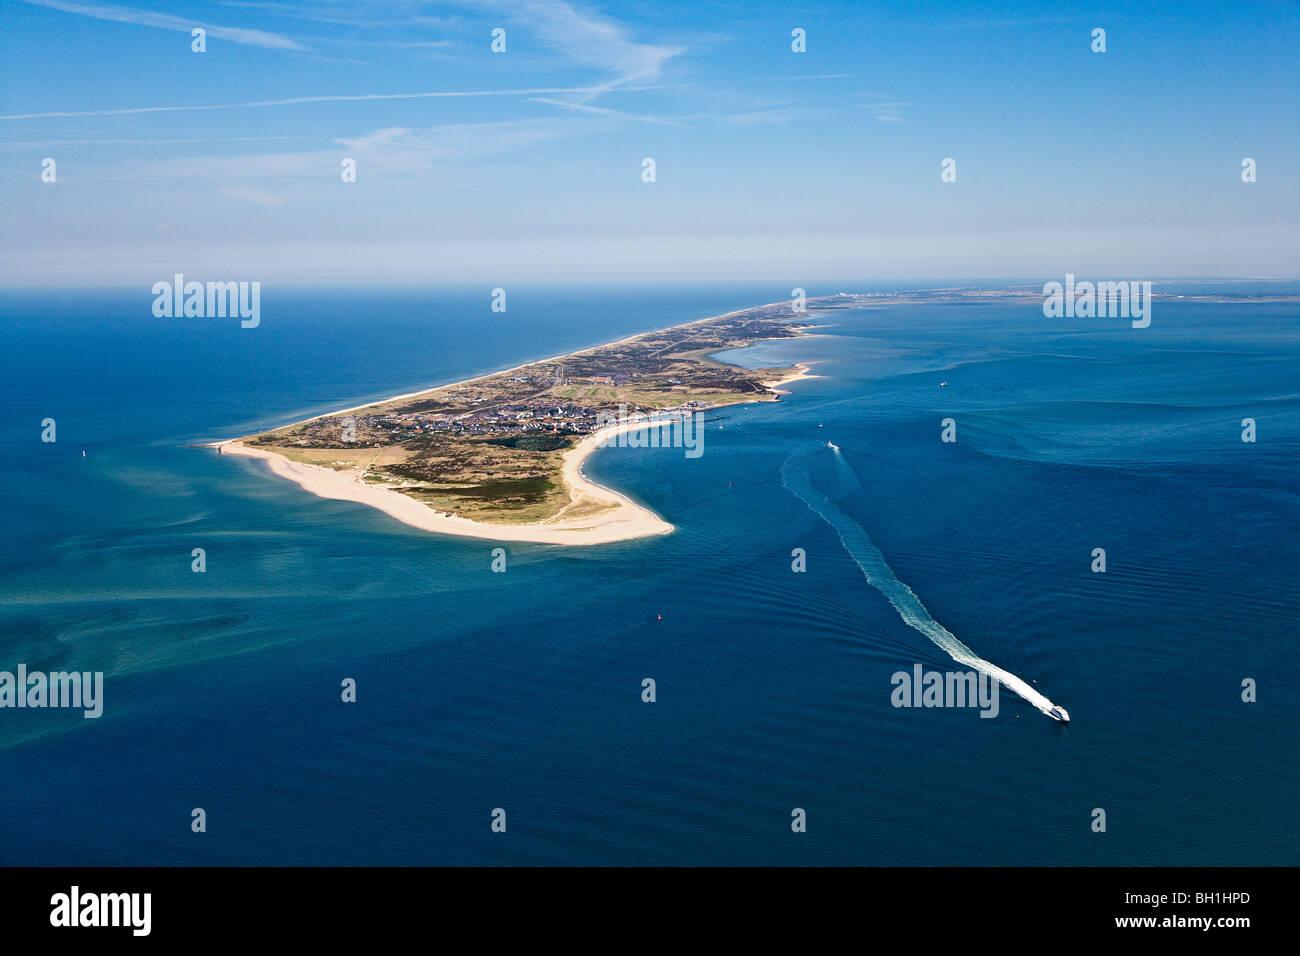 Aerial shot of Sylt Island, Schleswig-Holstein, Germany - Stock Image